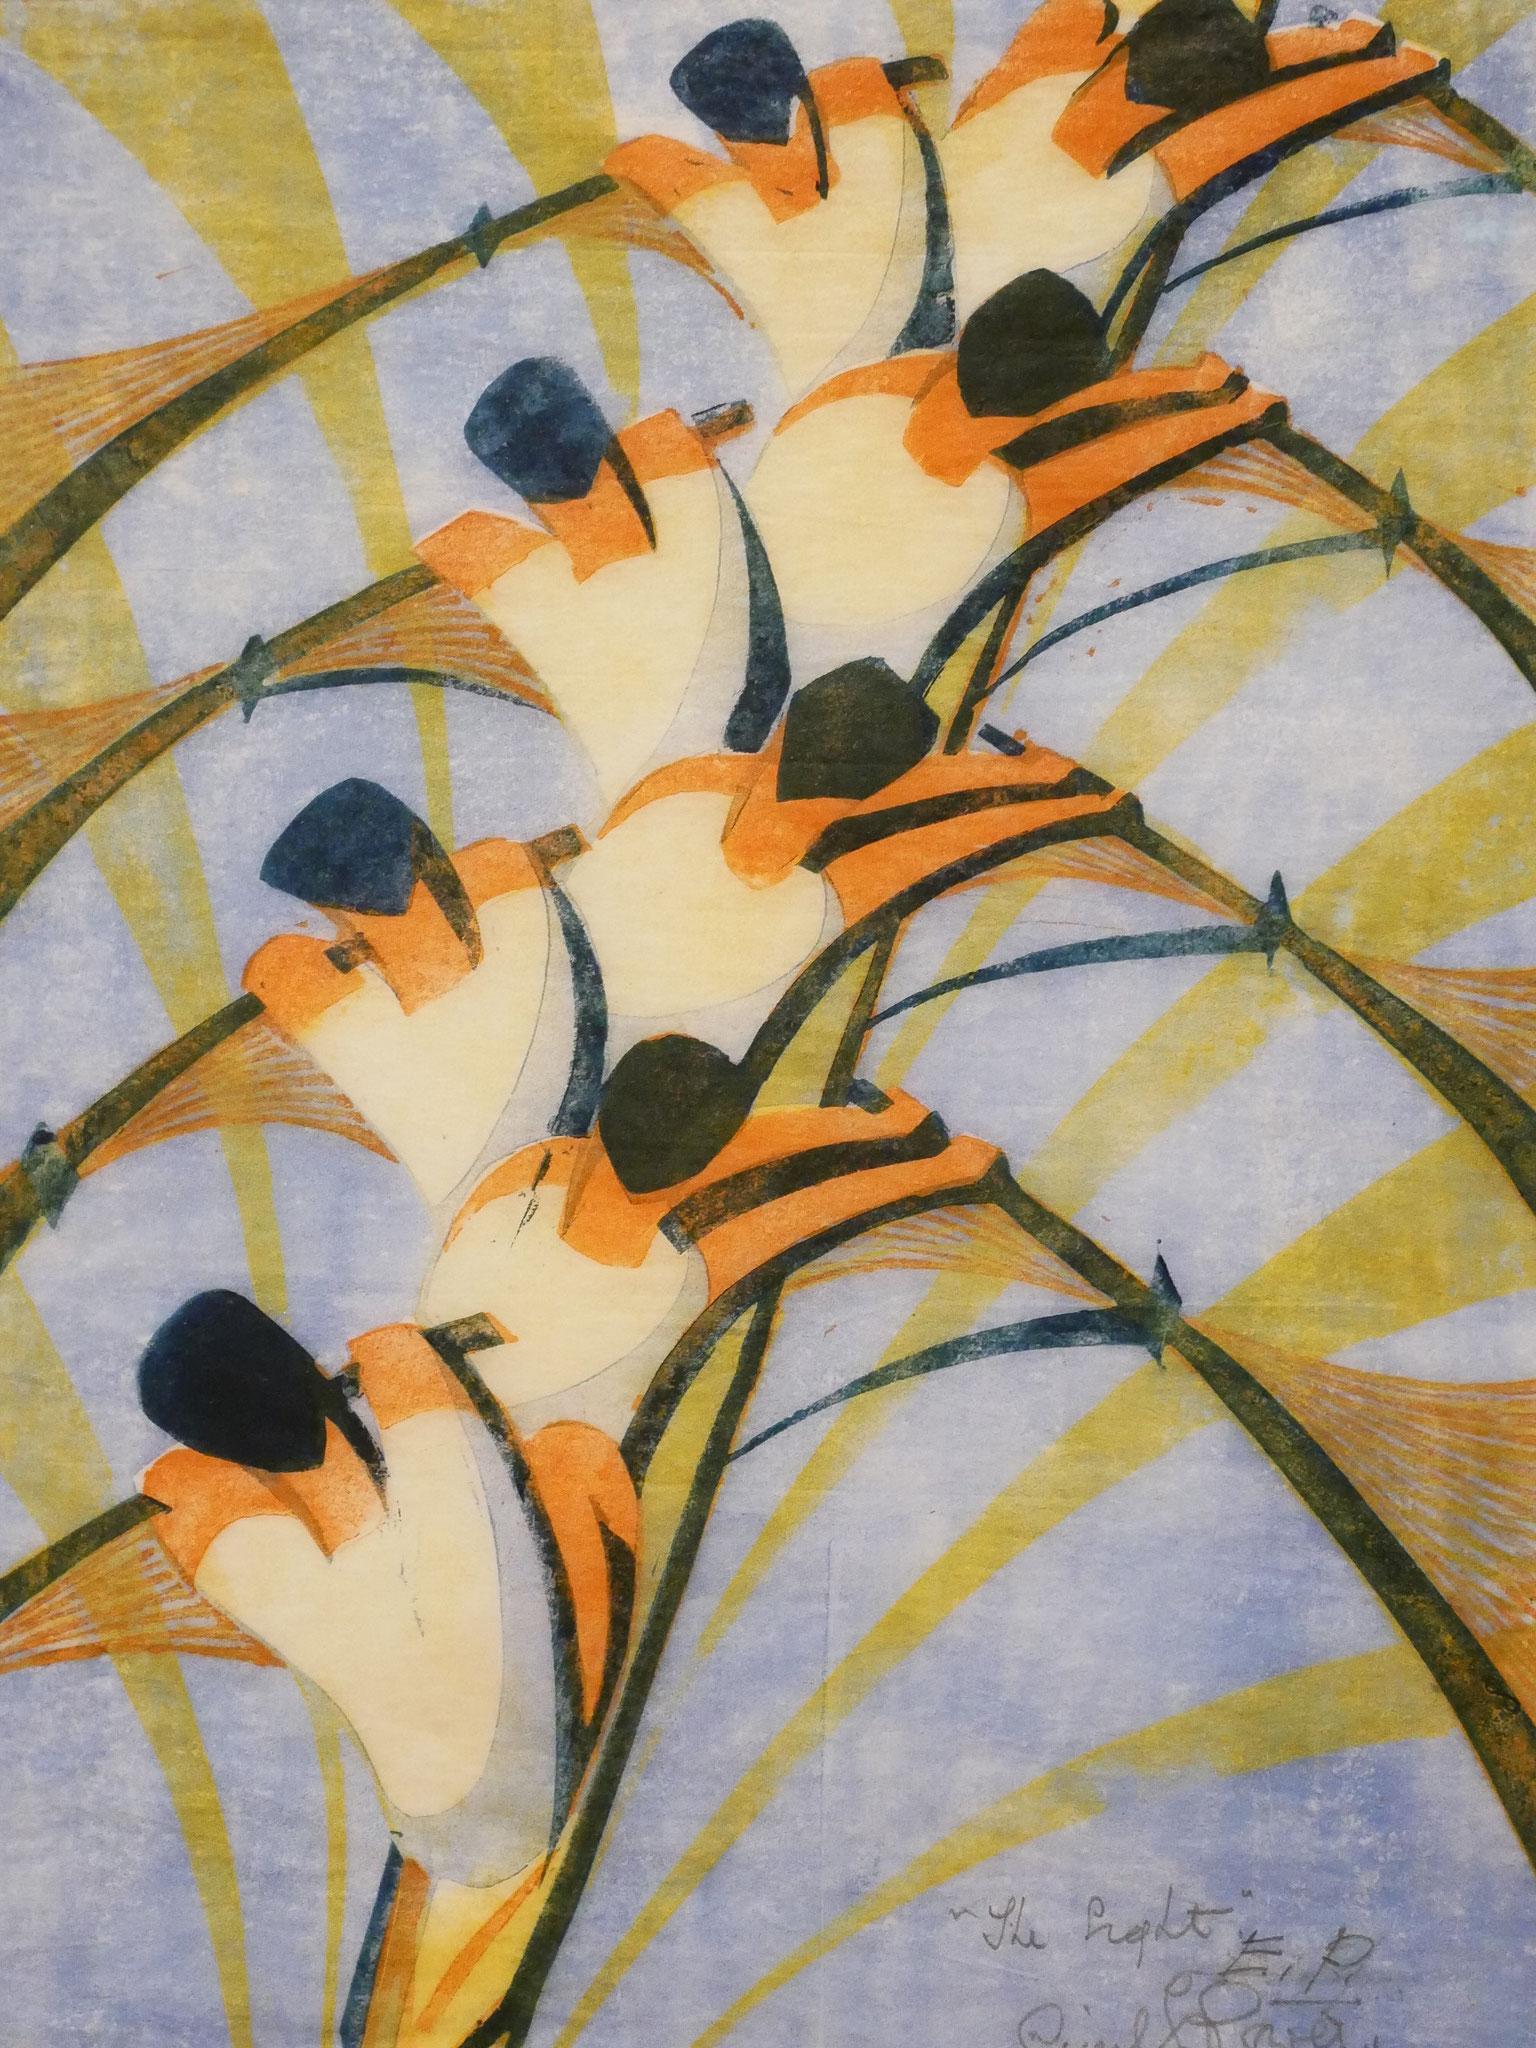 Cyril Edward Power, The Eight, 1930